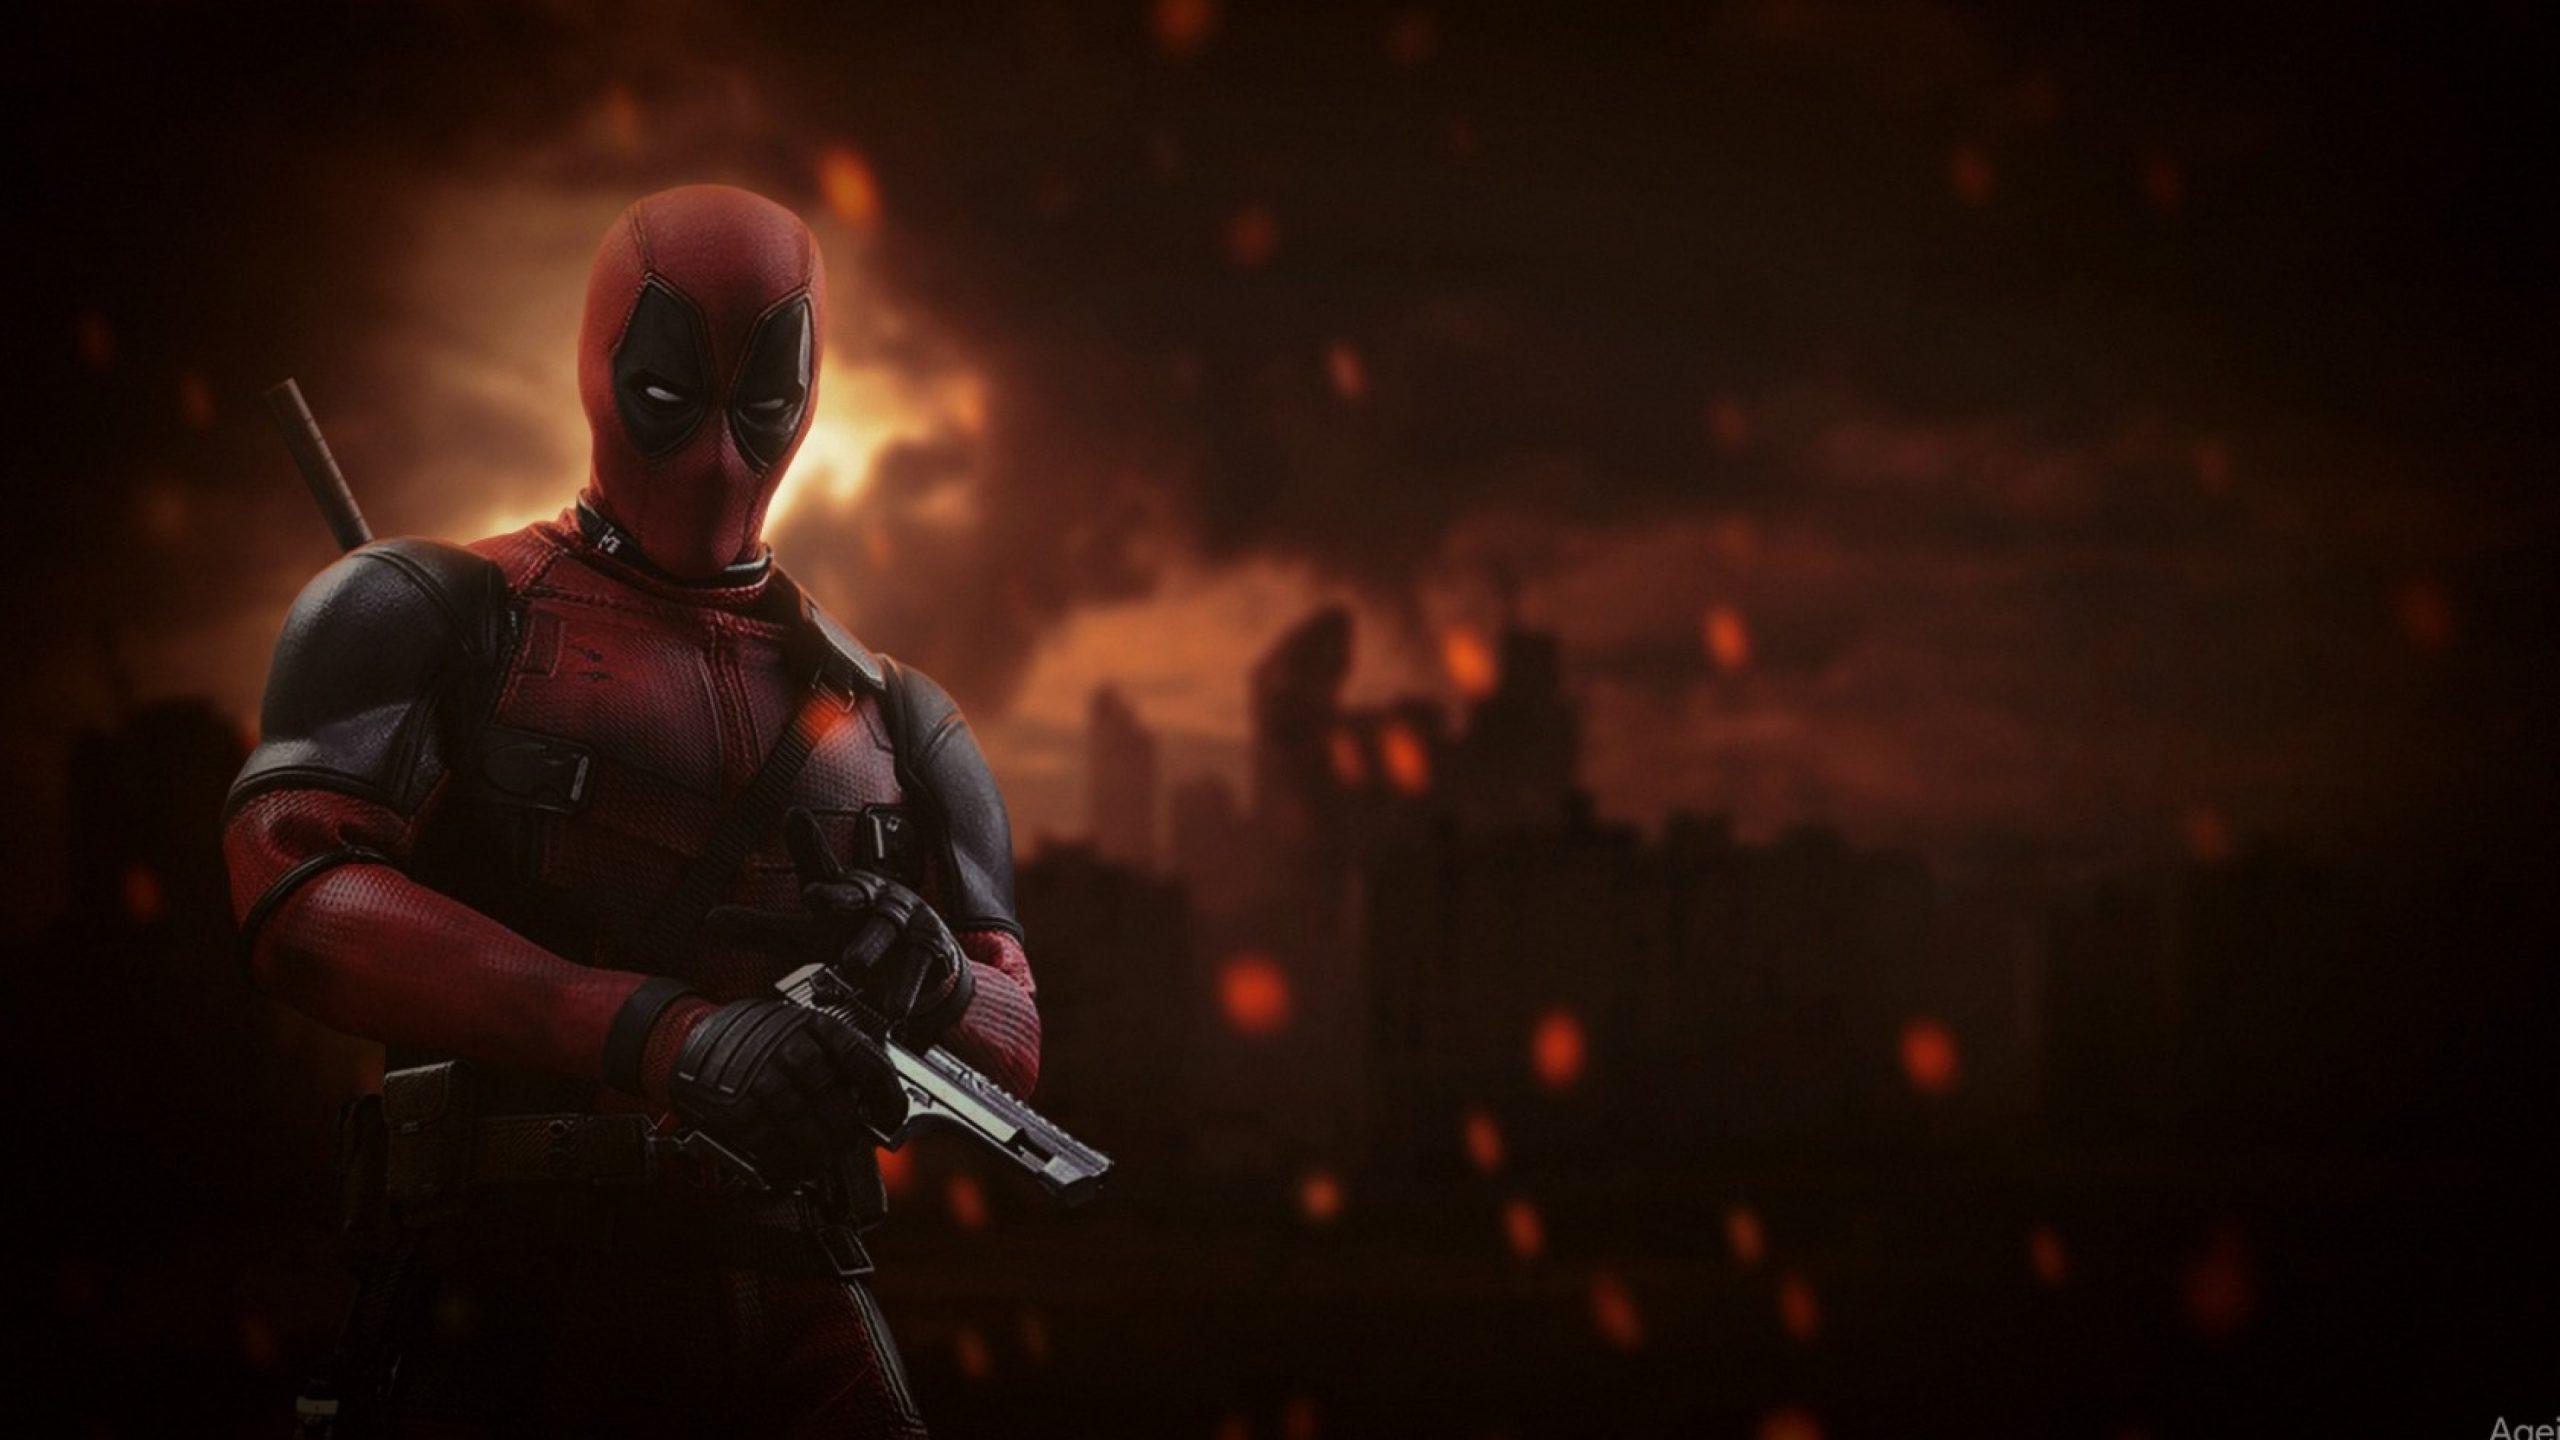 Deadpool Background image